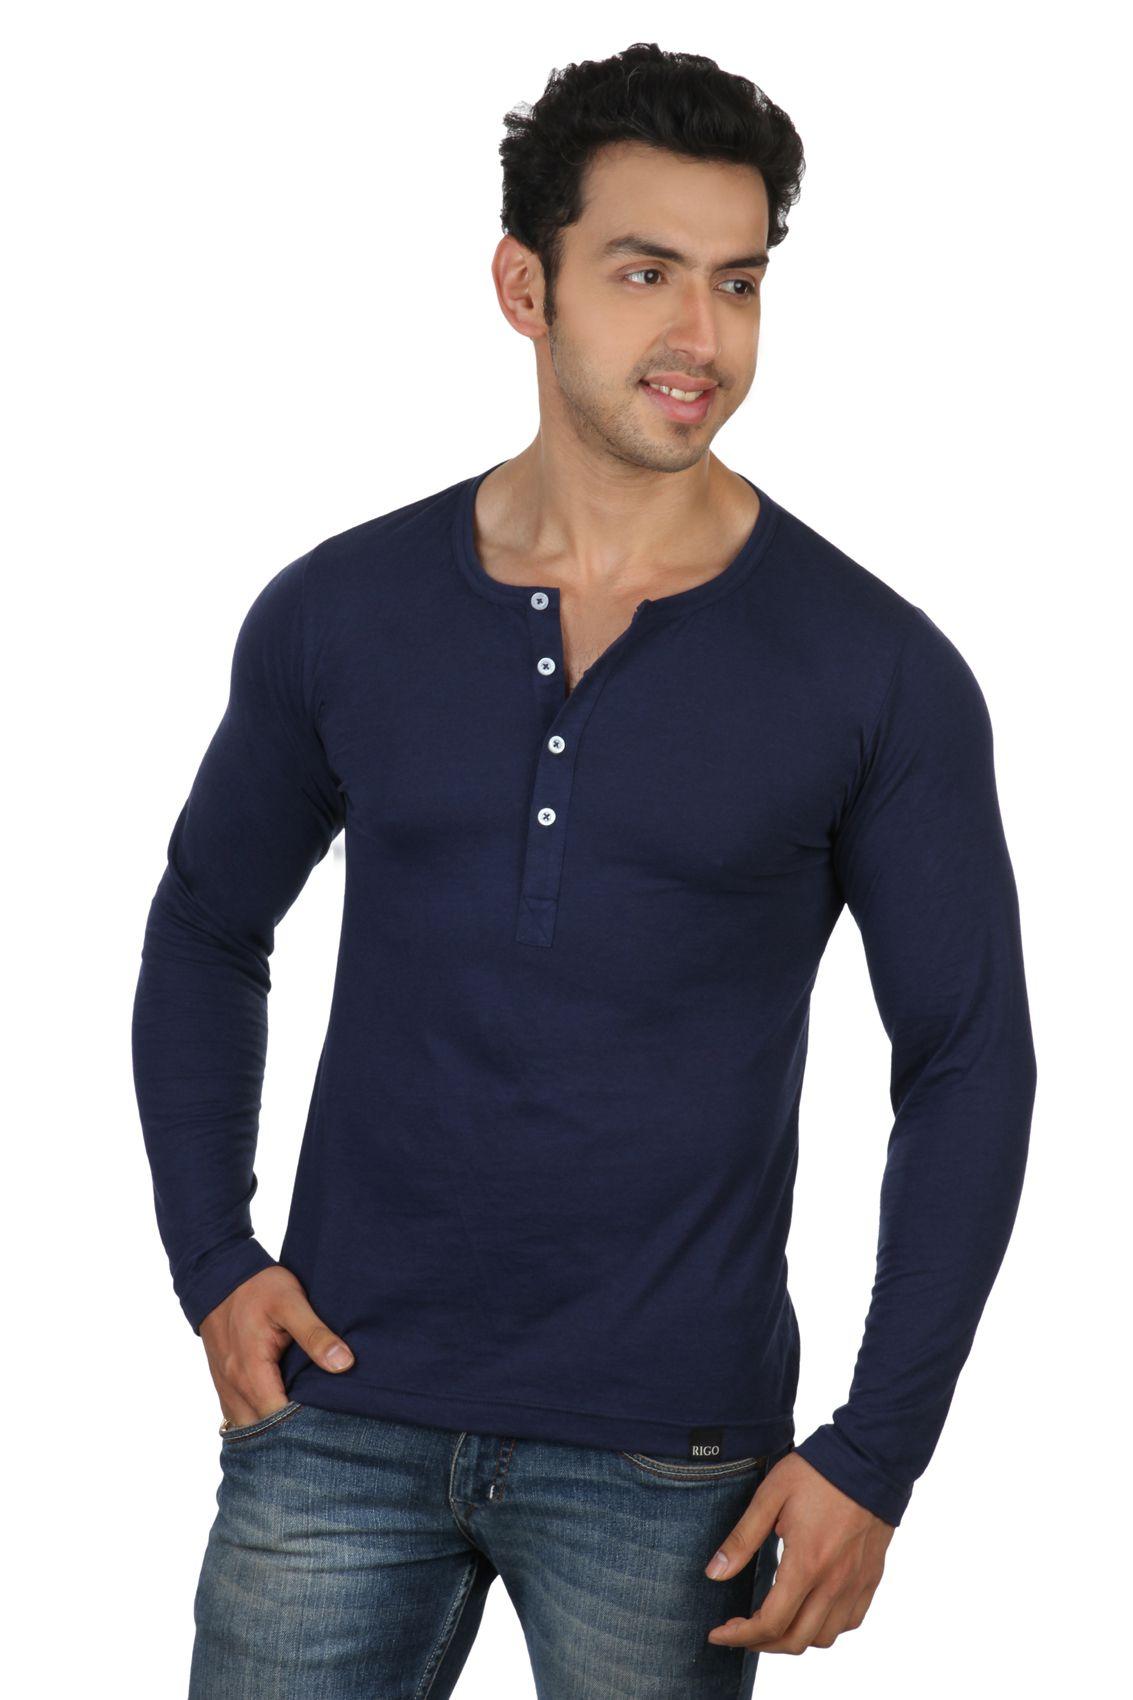 Rigo Navy Blue Slim Fit Henley T-Shirt